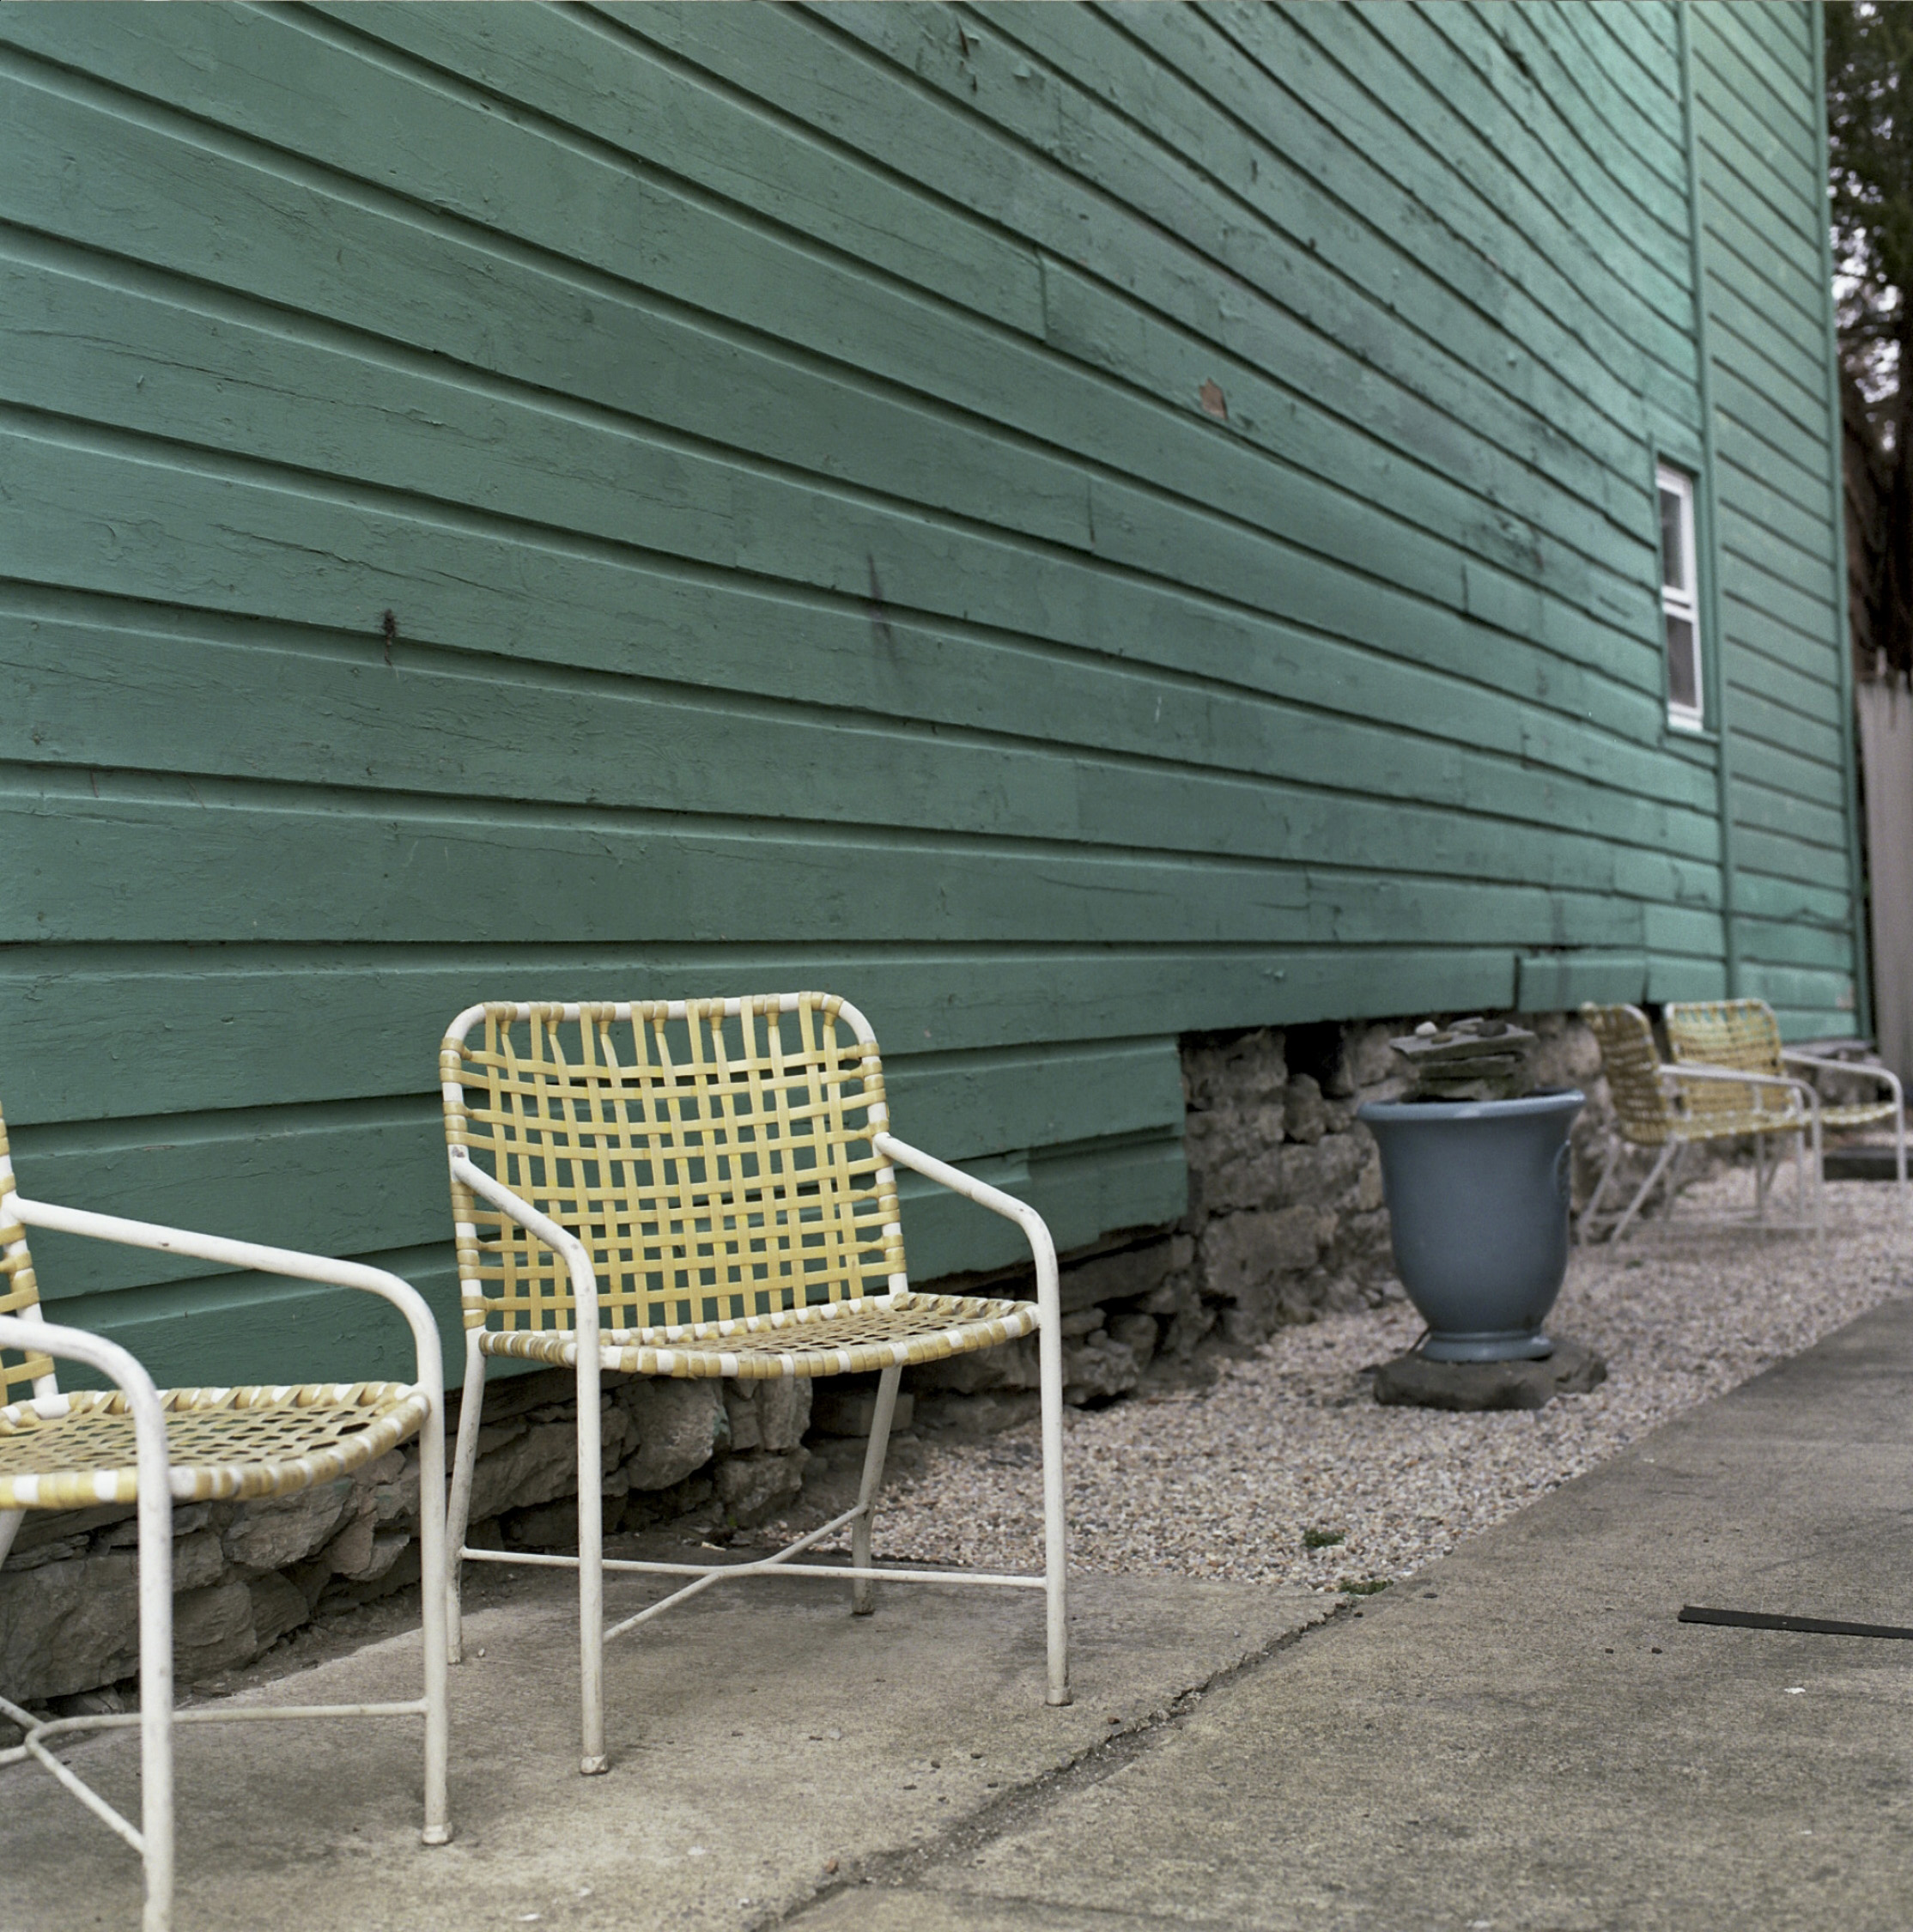 hudson-ny-chairs-hudson-gd copy.jpg